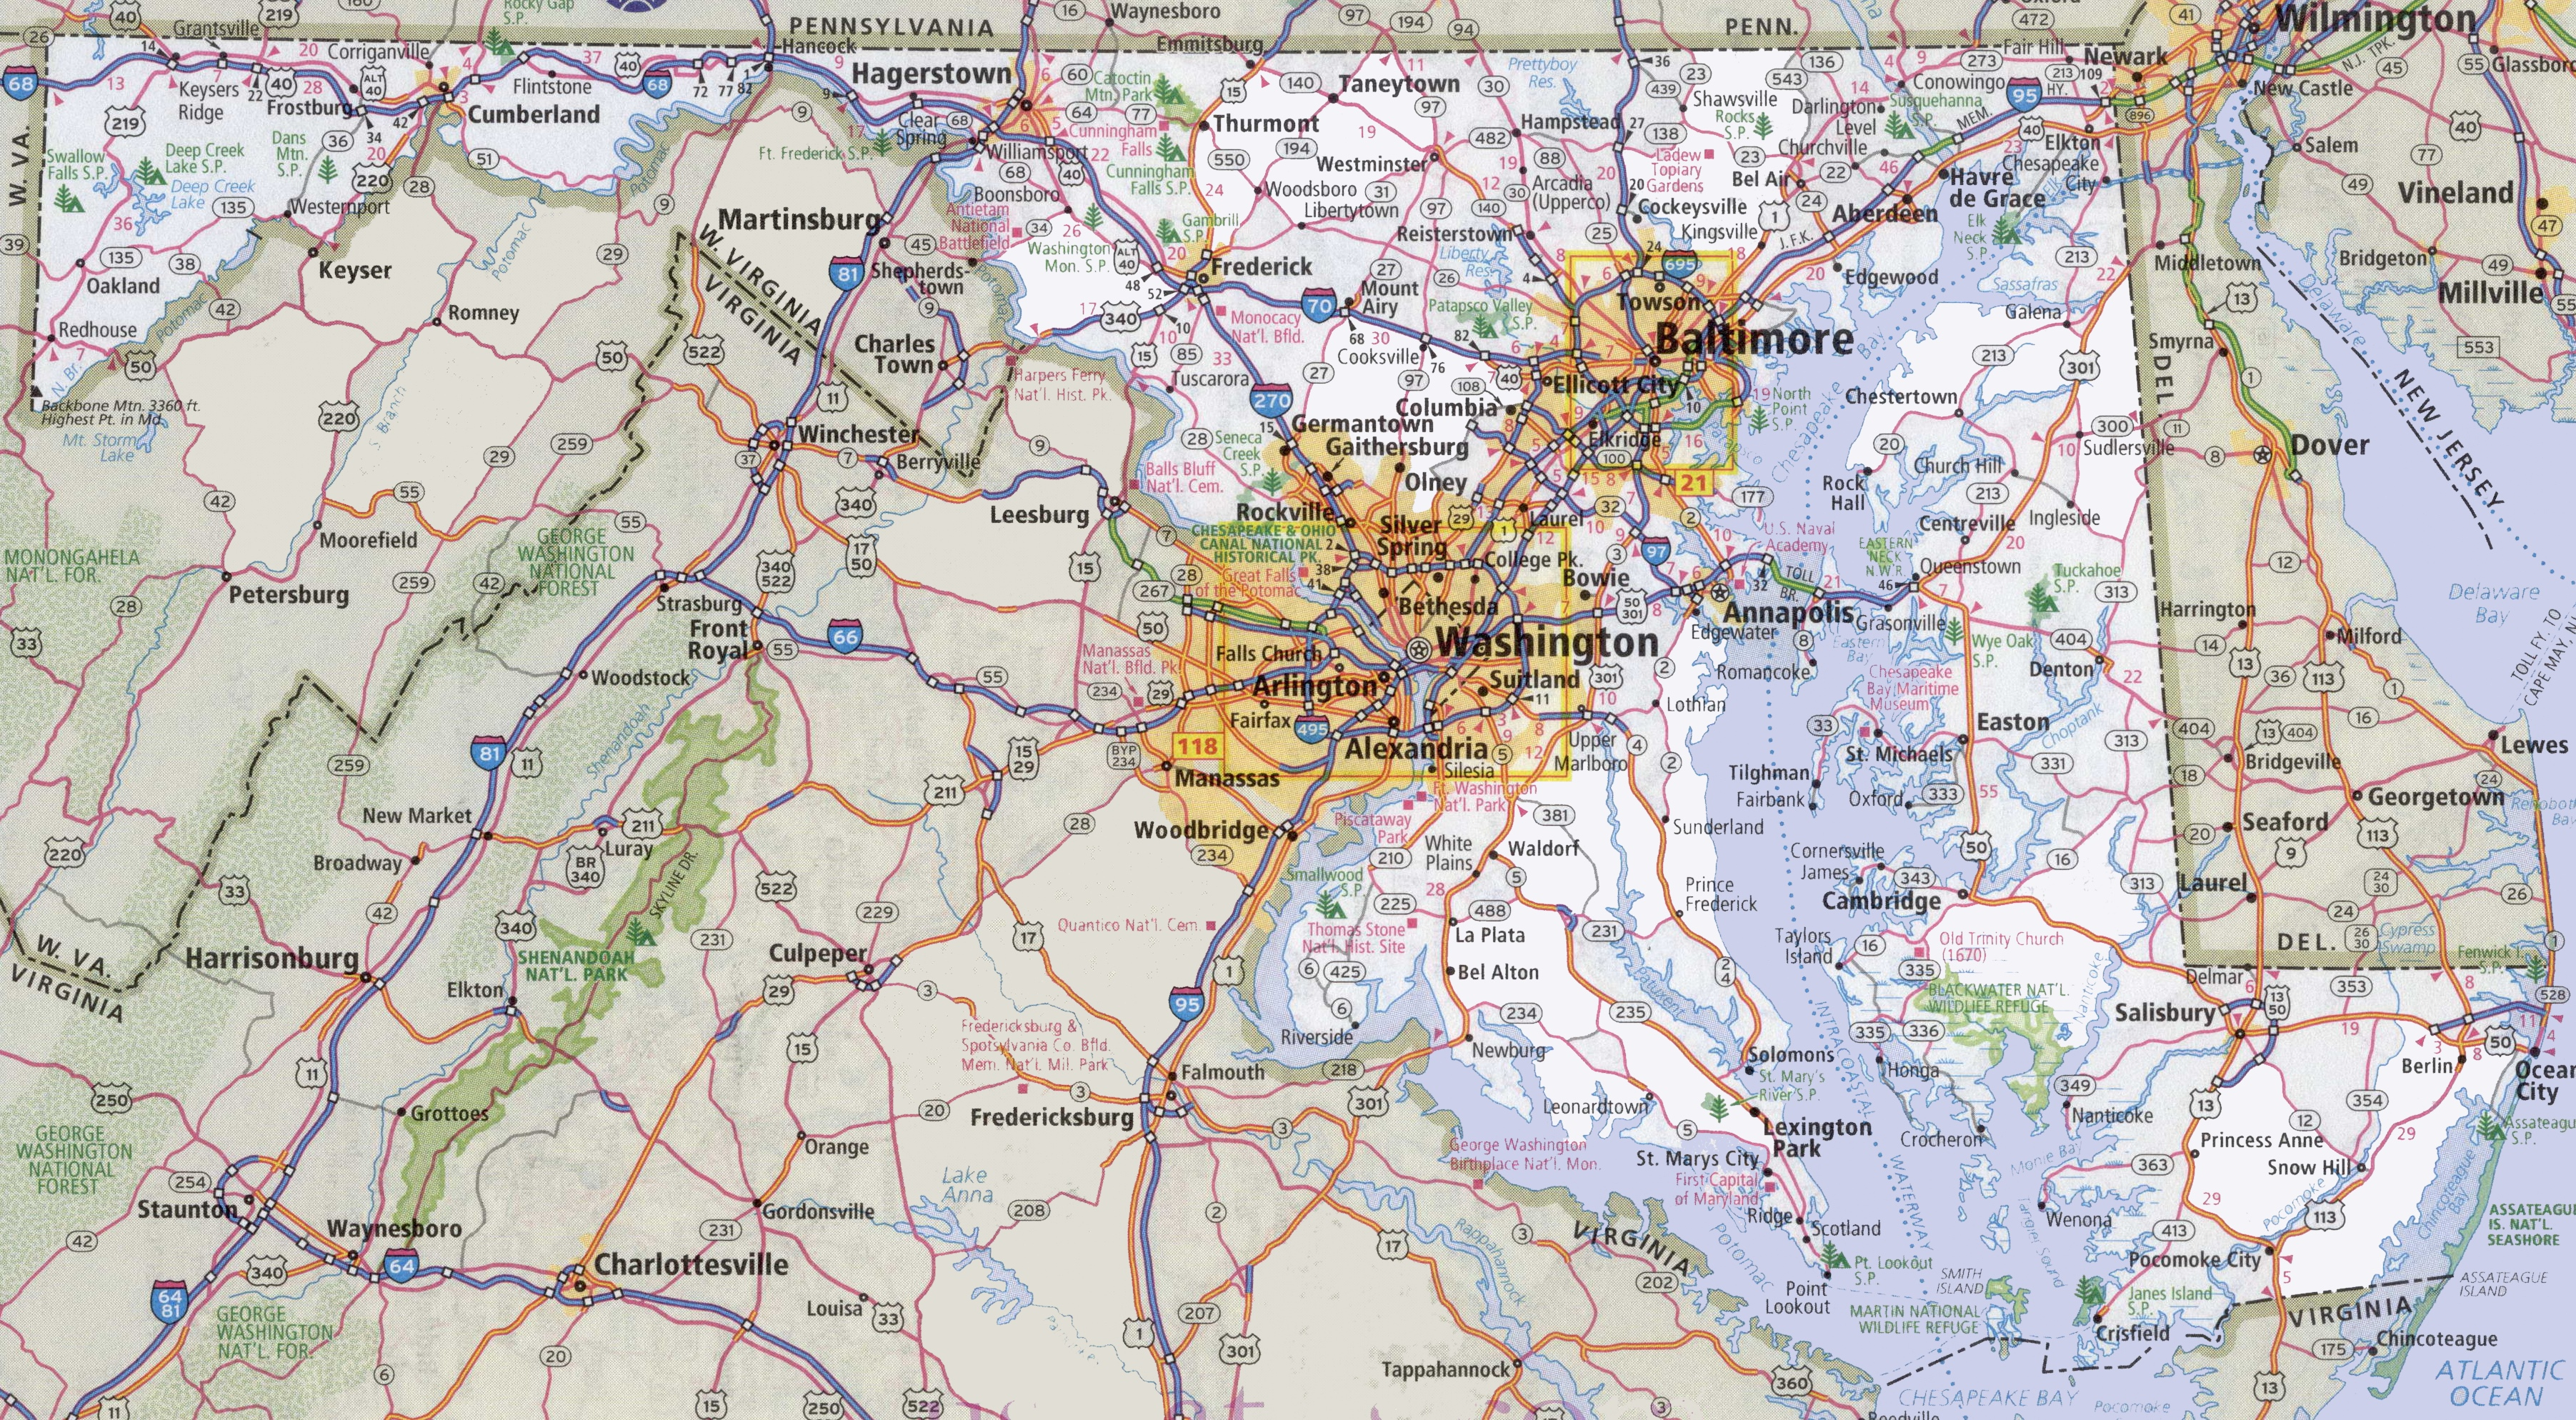 Road Map Of Maryland Maryland road map Road Map Of Maryland